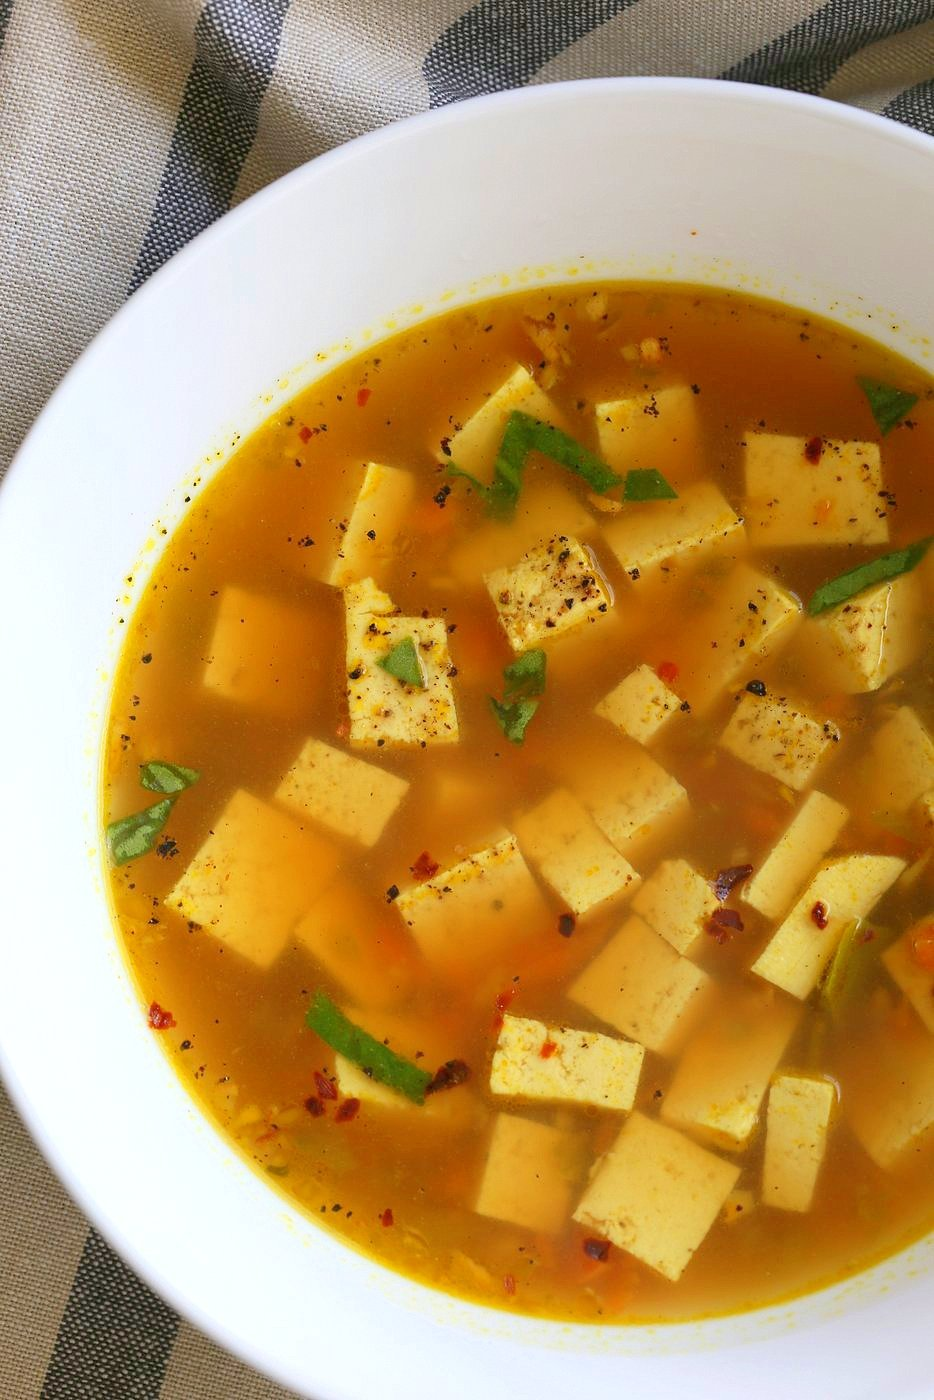 Turmeric Miso Soup With Ginger, Garlic and Tofu. Kick that cold with this soothing, anti inflammatory, brothy soup. Vegan Gluten-free Nut-free #vegan #Recipe #veganricha | VeganRicha.com